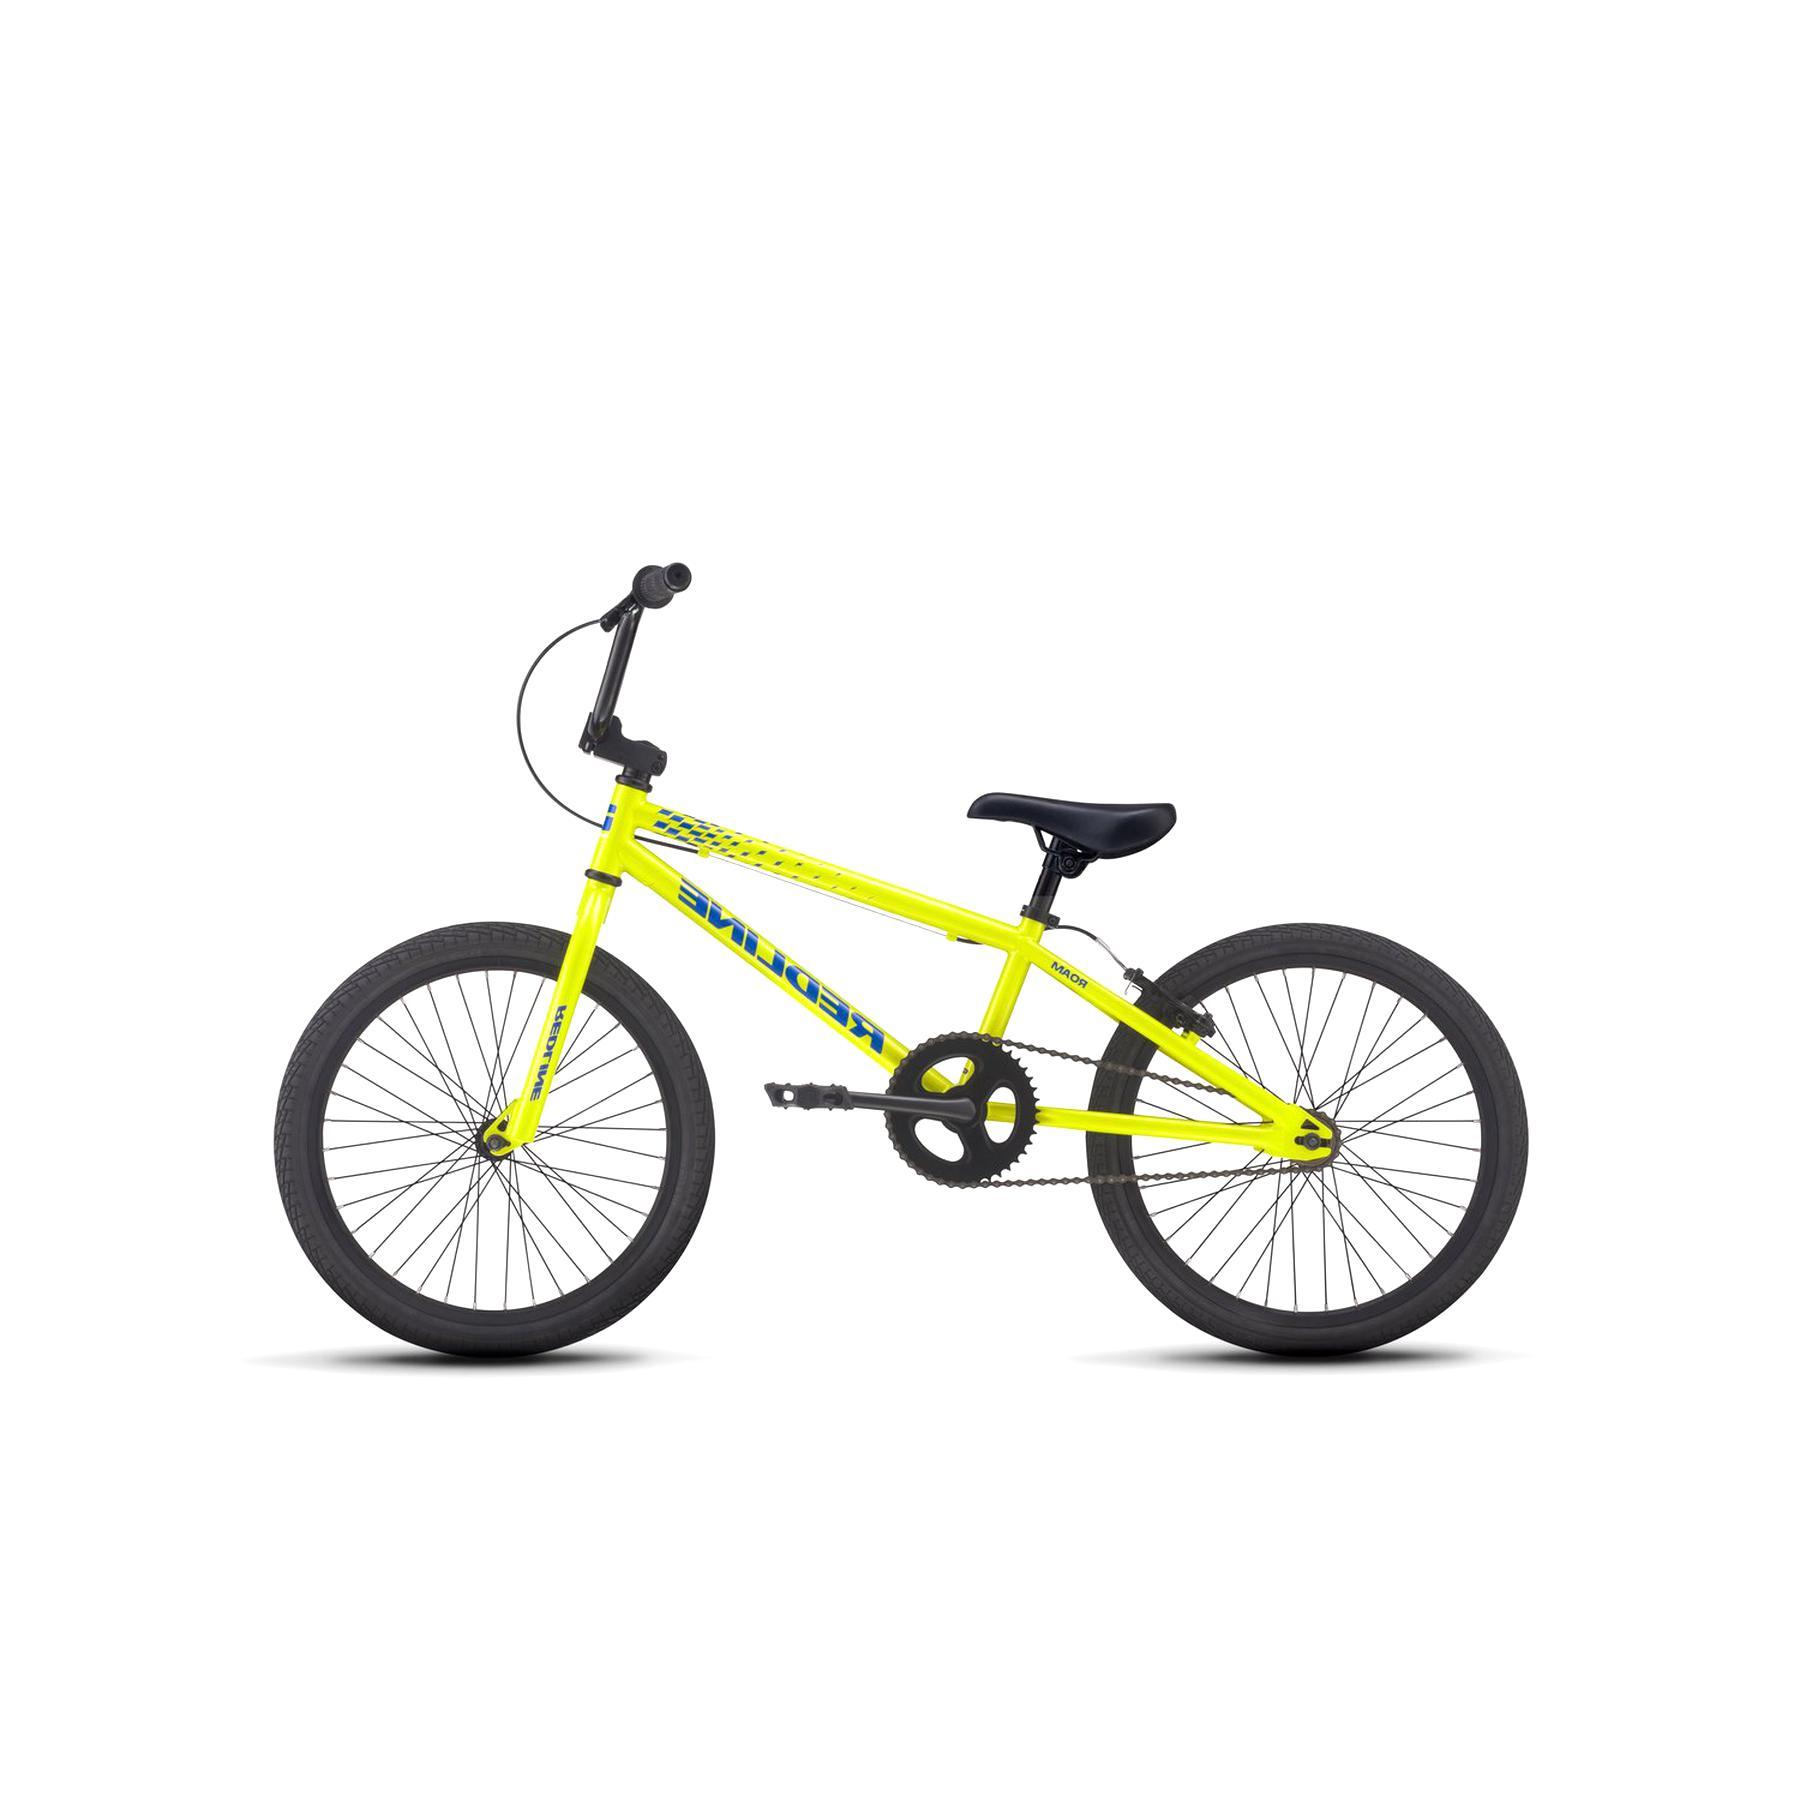 Redline Bmx Bikes For Sale Only 3 Left At 65